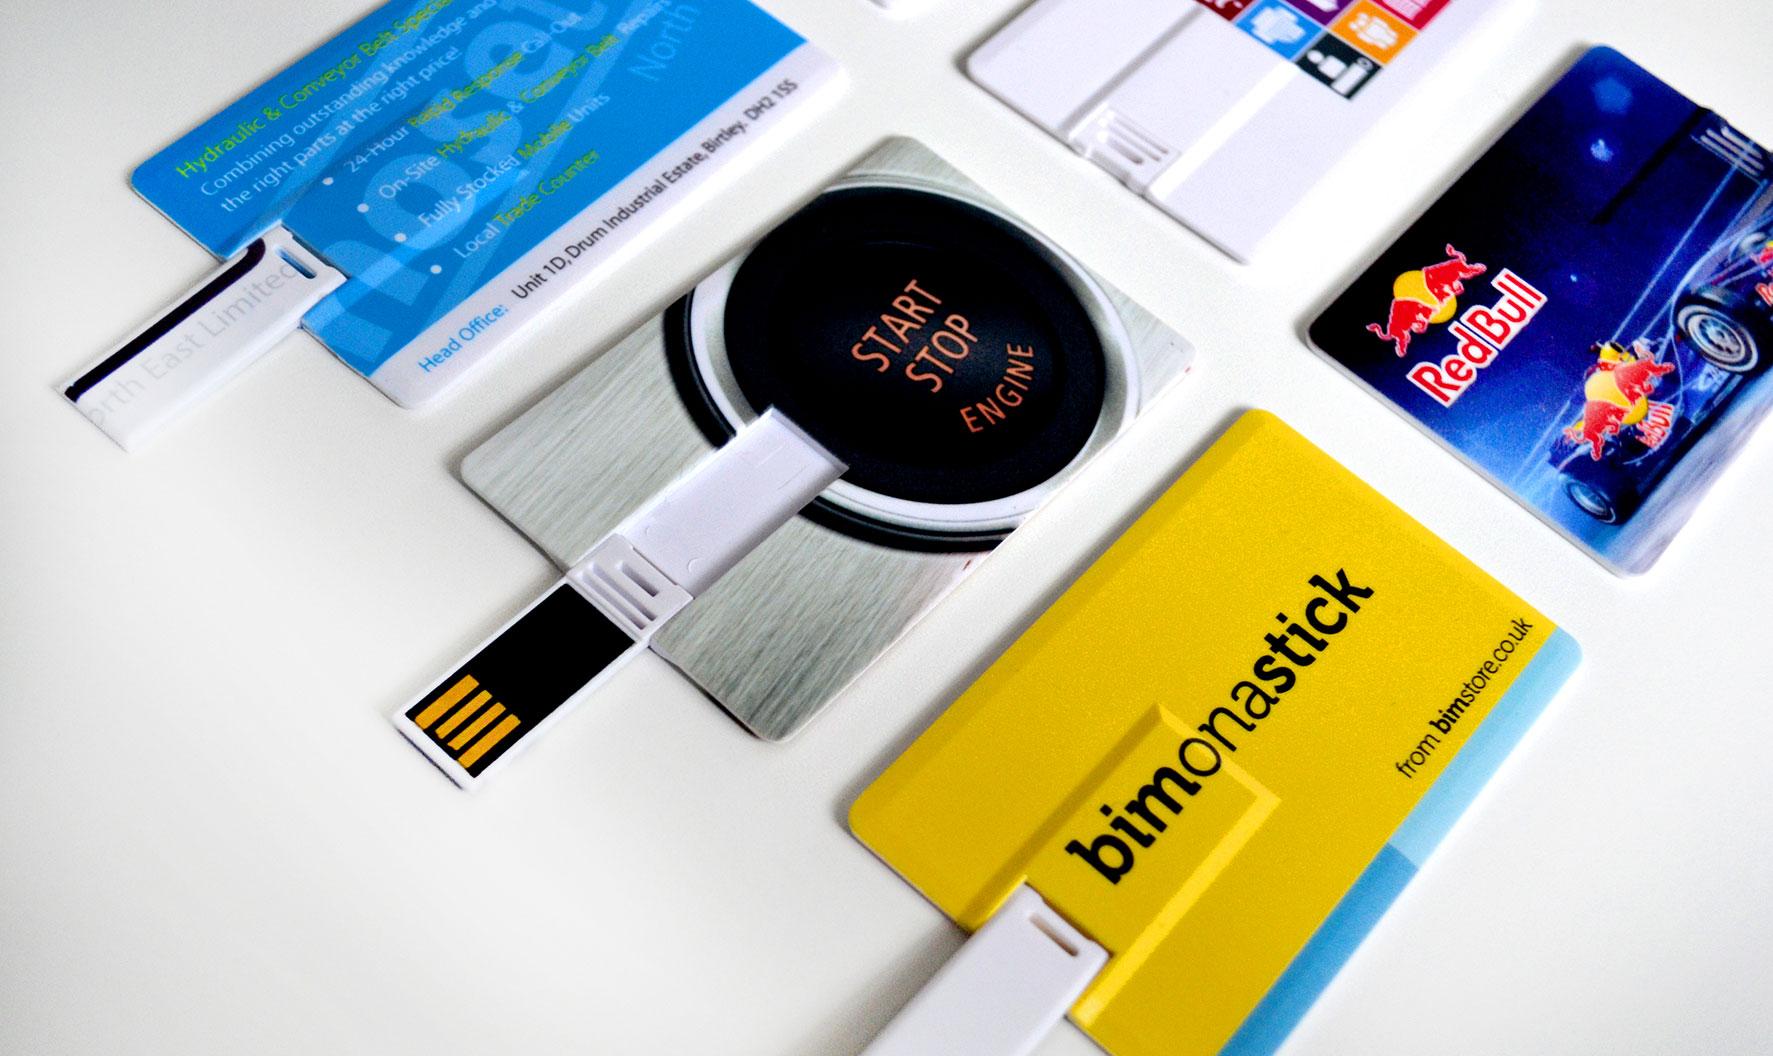 Branded Credit Card USB Flash Drive - 4GB